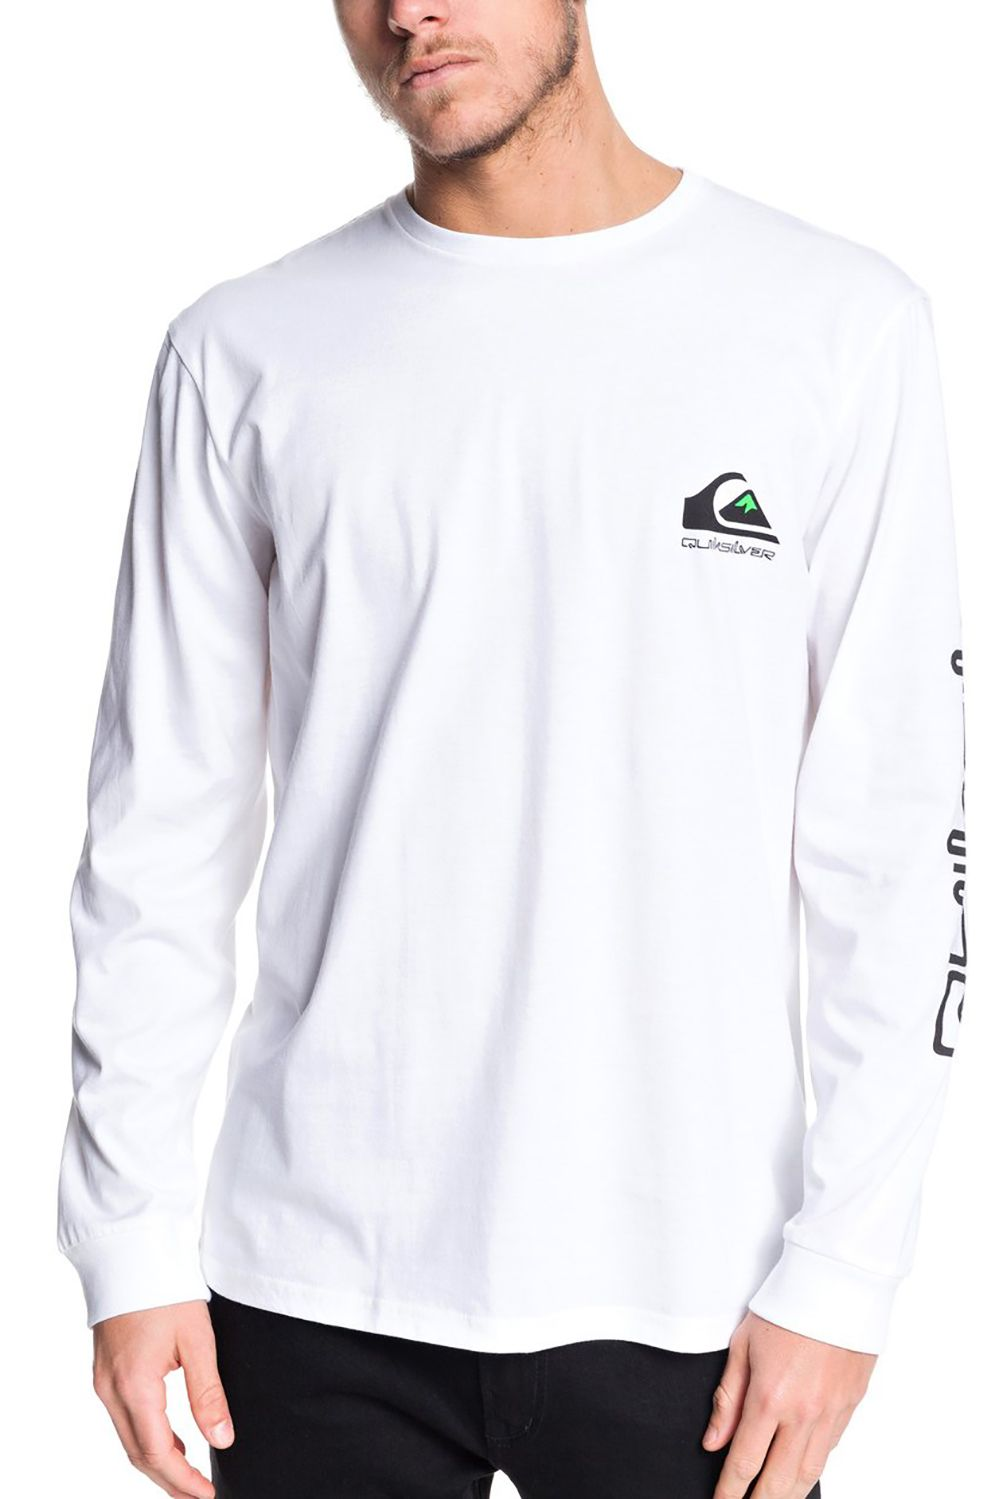 Quiksilver L-Sleeve OMNI LOGO CLASSIC White